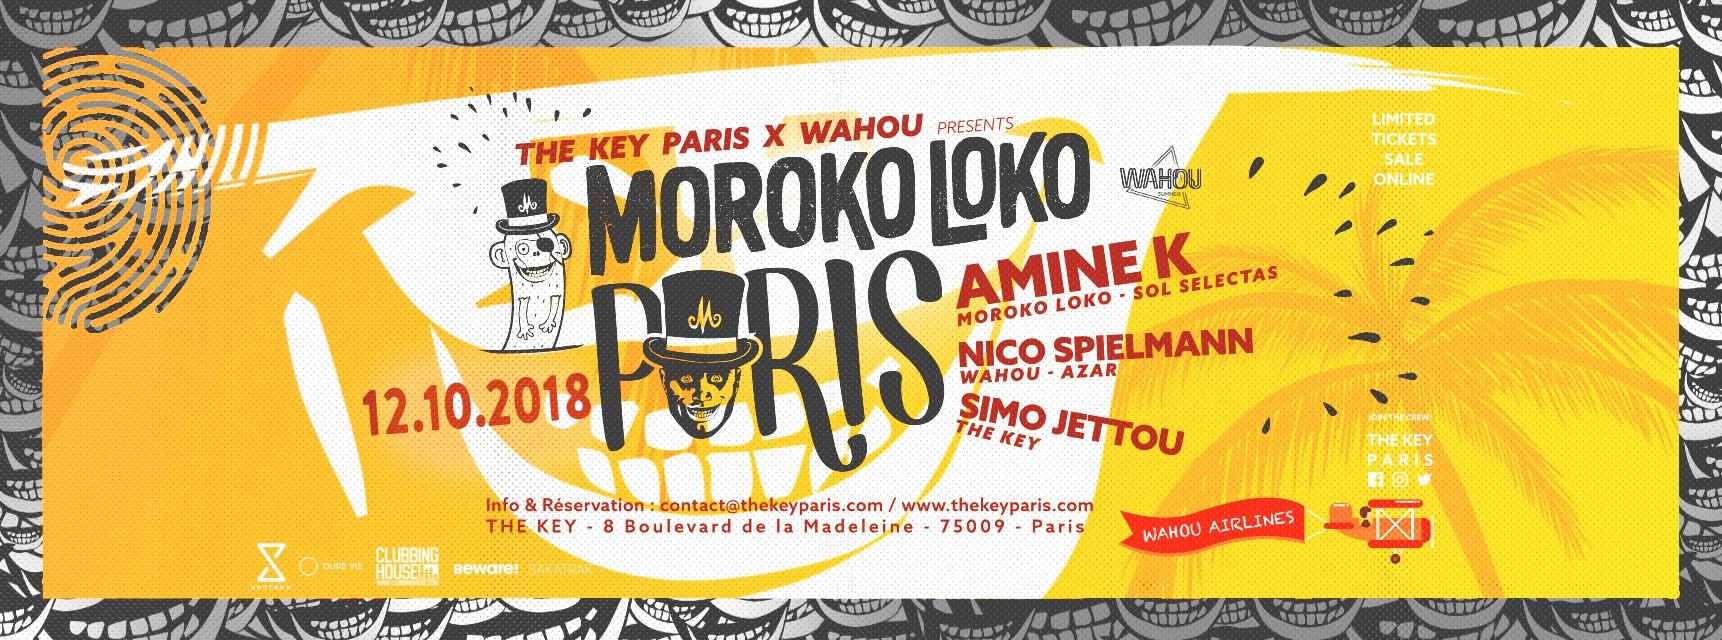 The Key Paris & Wahou Presents Moroko Loko • Amine K & friends